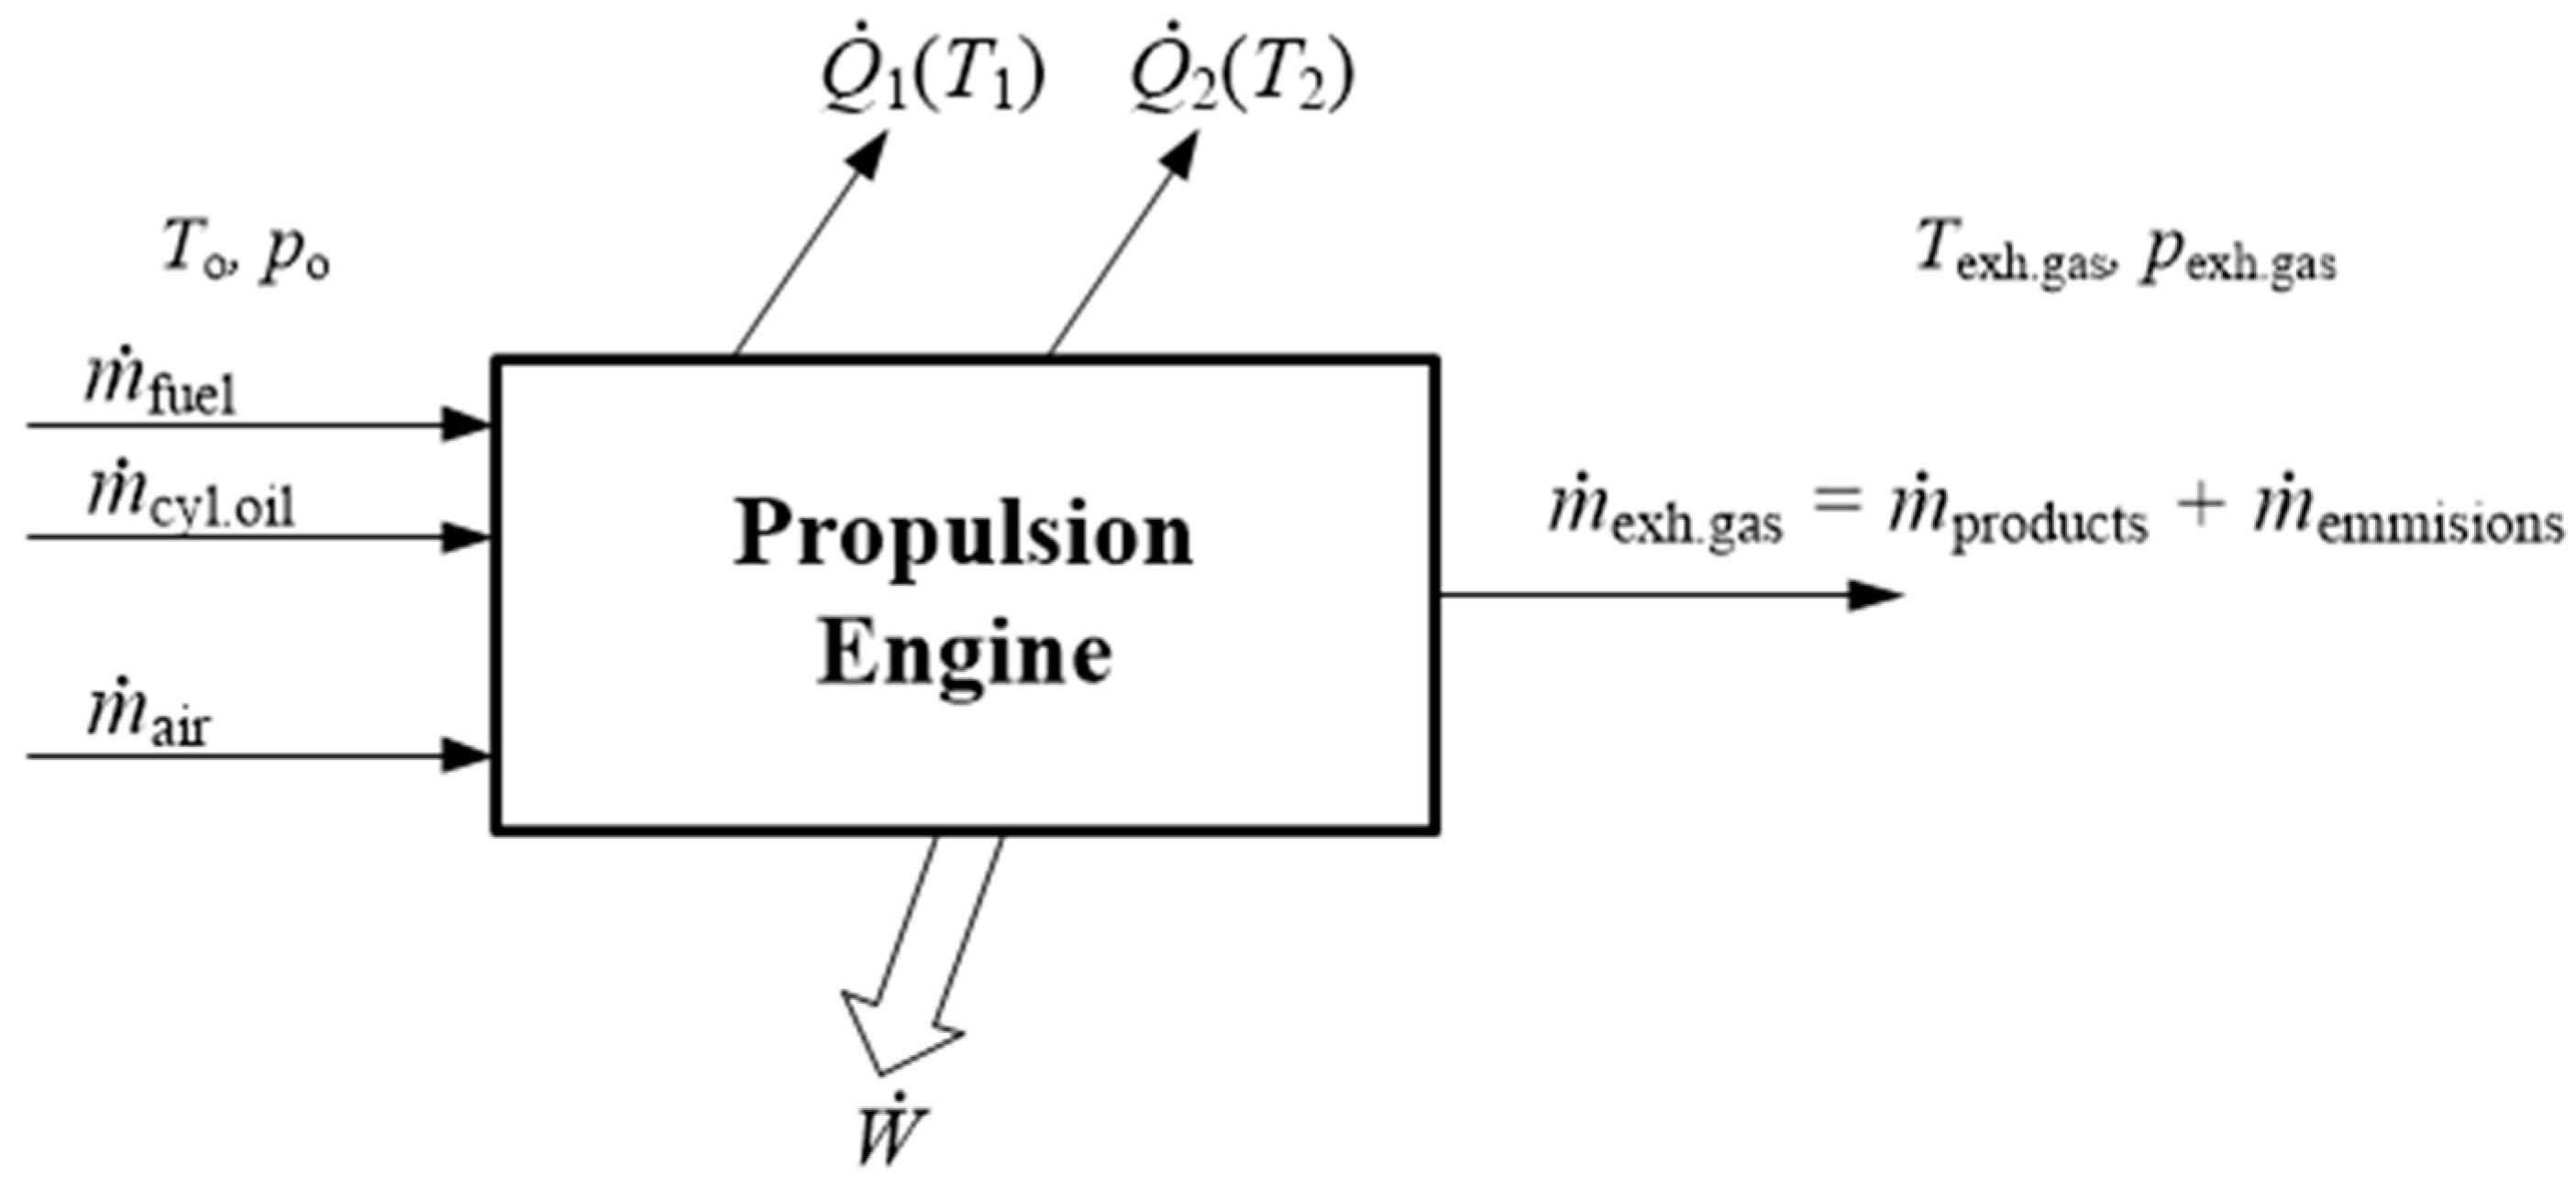 Valve Timing Diagram Of Four Stroke Diesel Engine Energies Free Full Text Of Valve Timing Diagram Of Four Stroke Diesel Engine